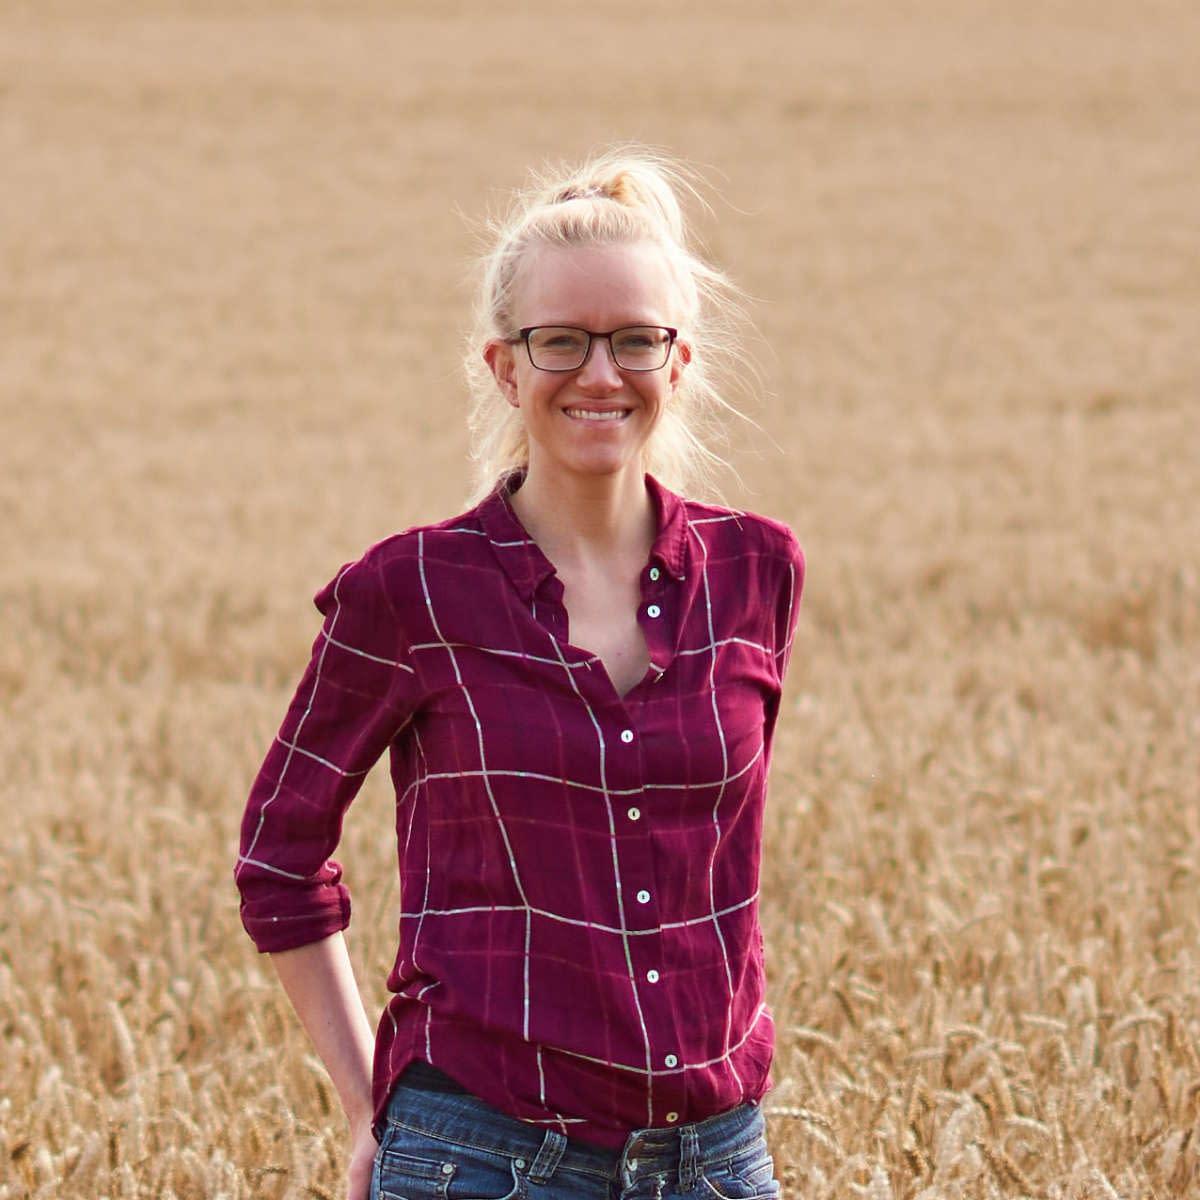 Lisa Portrait am Feld